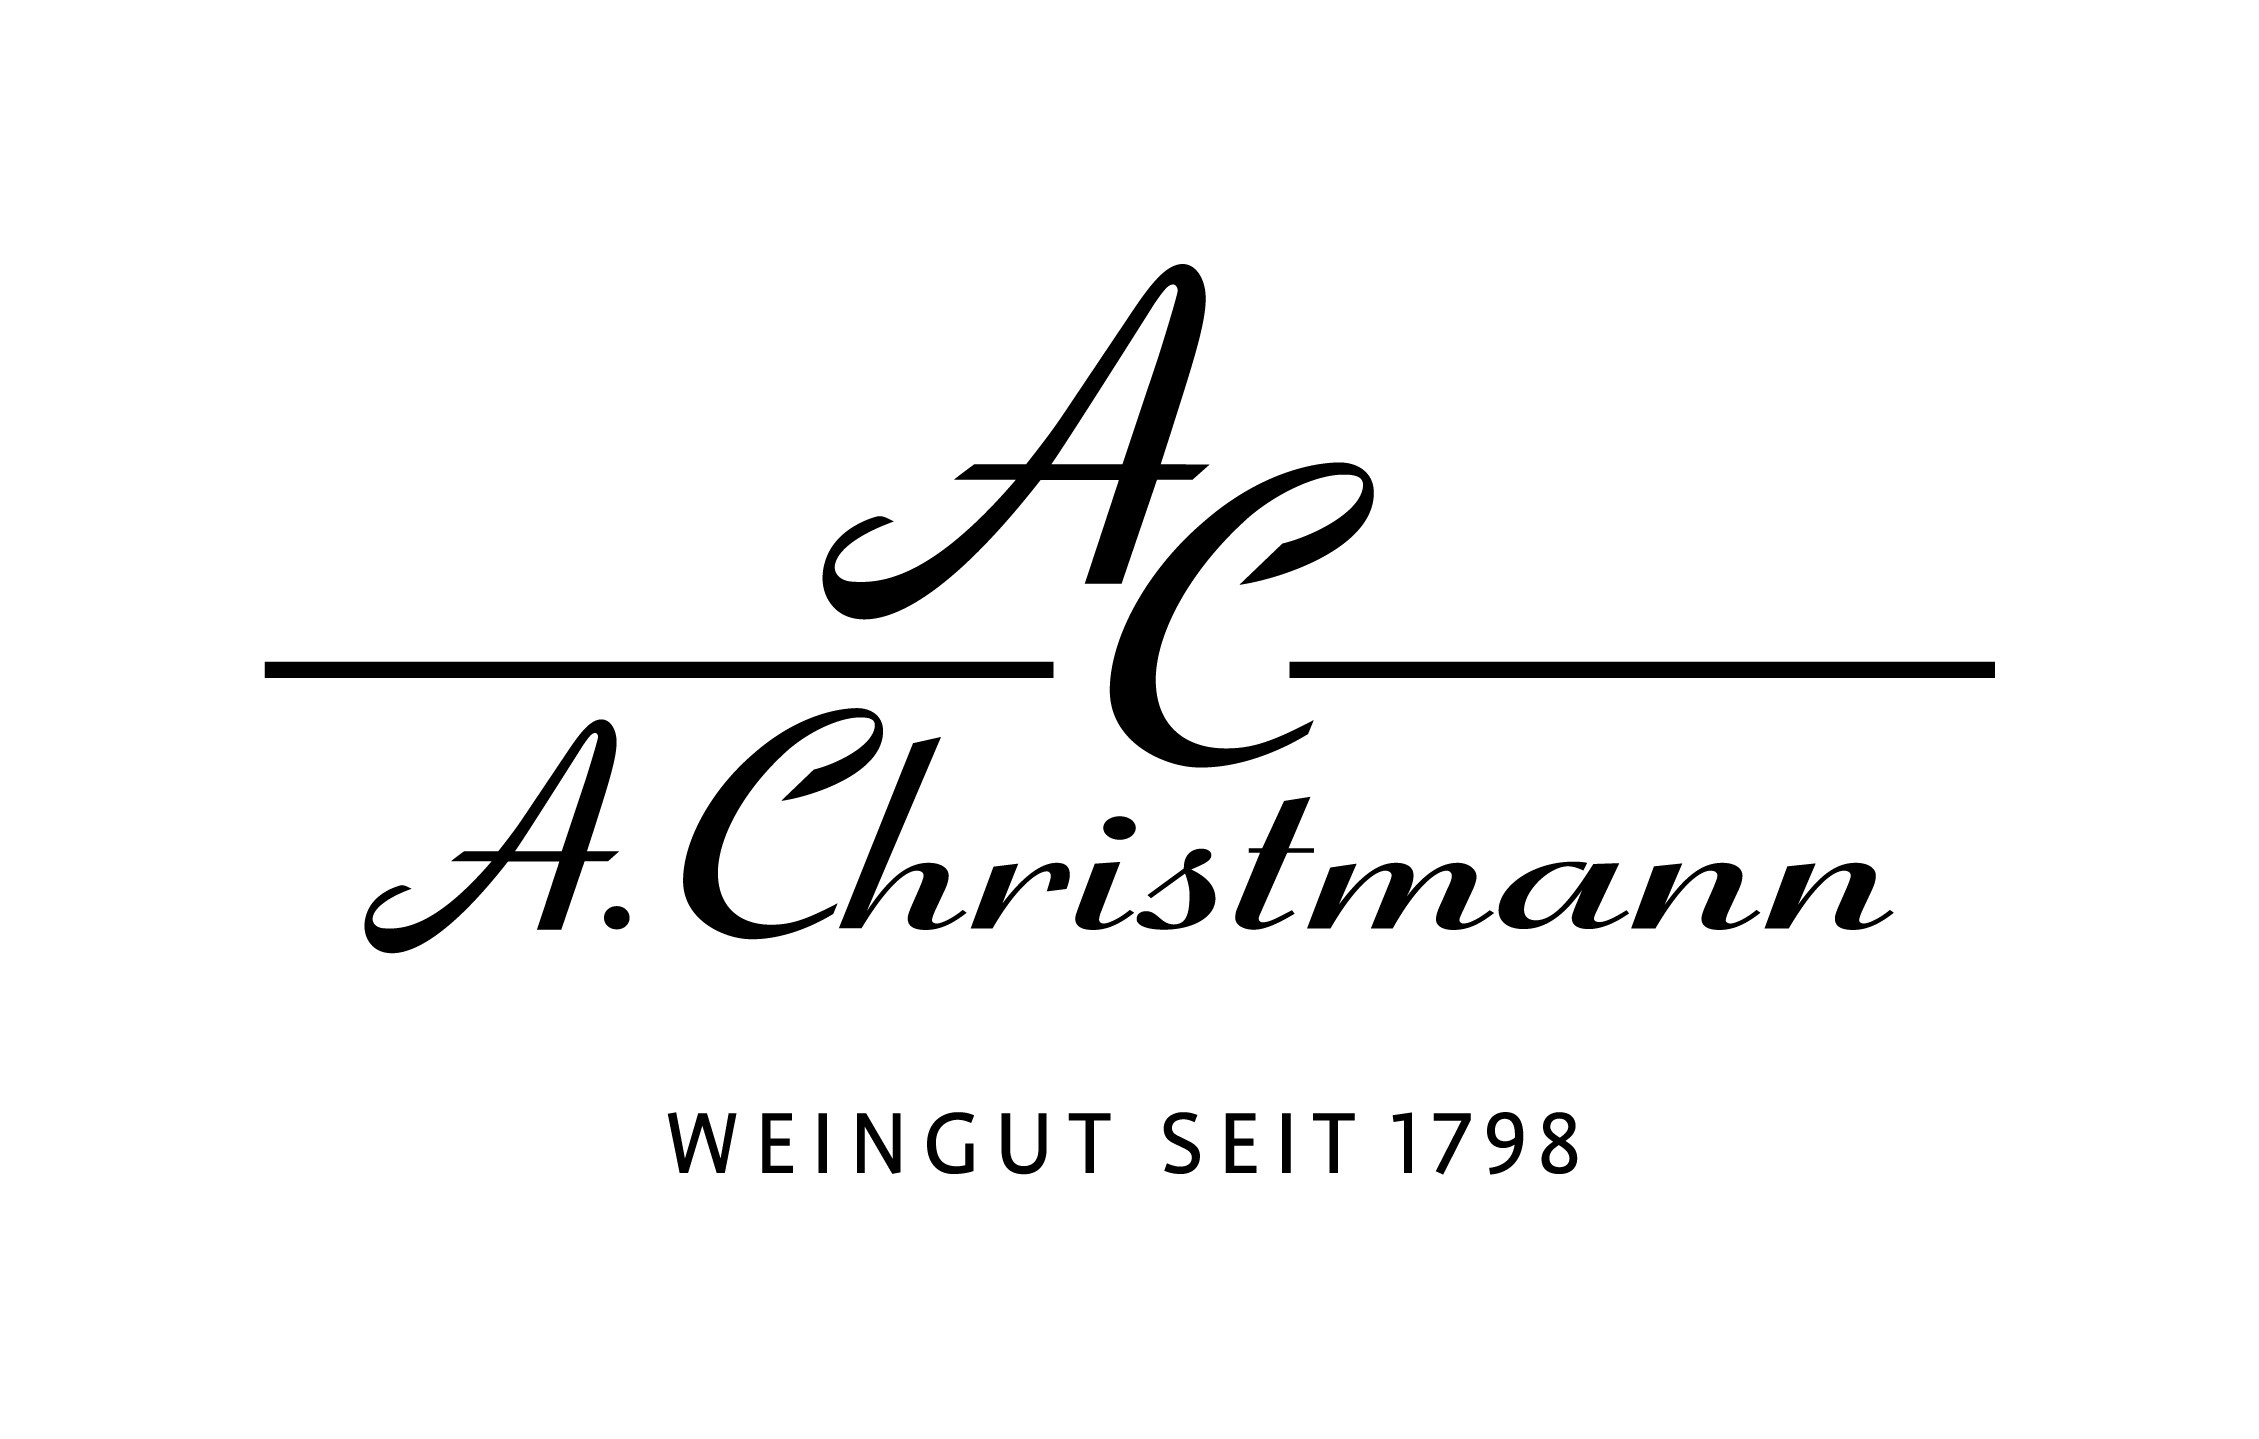 A. CHRISTMANN (VDP - Pfalz)